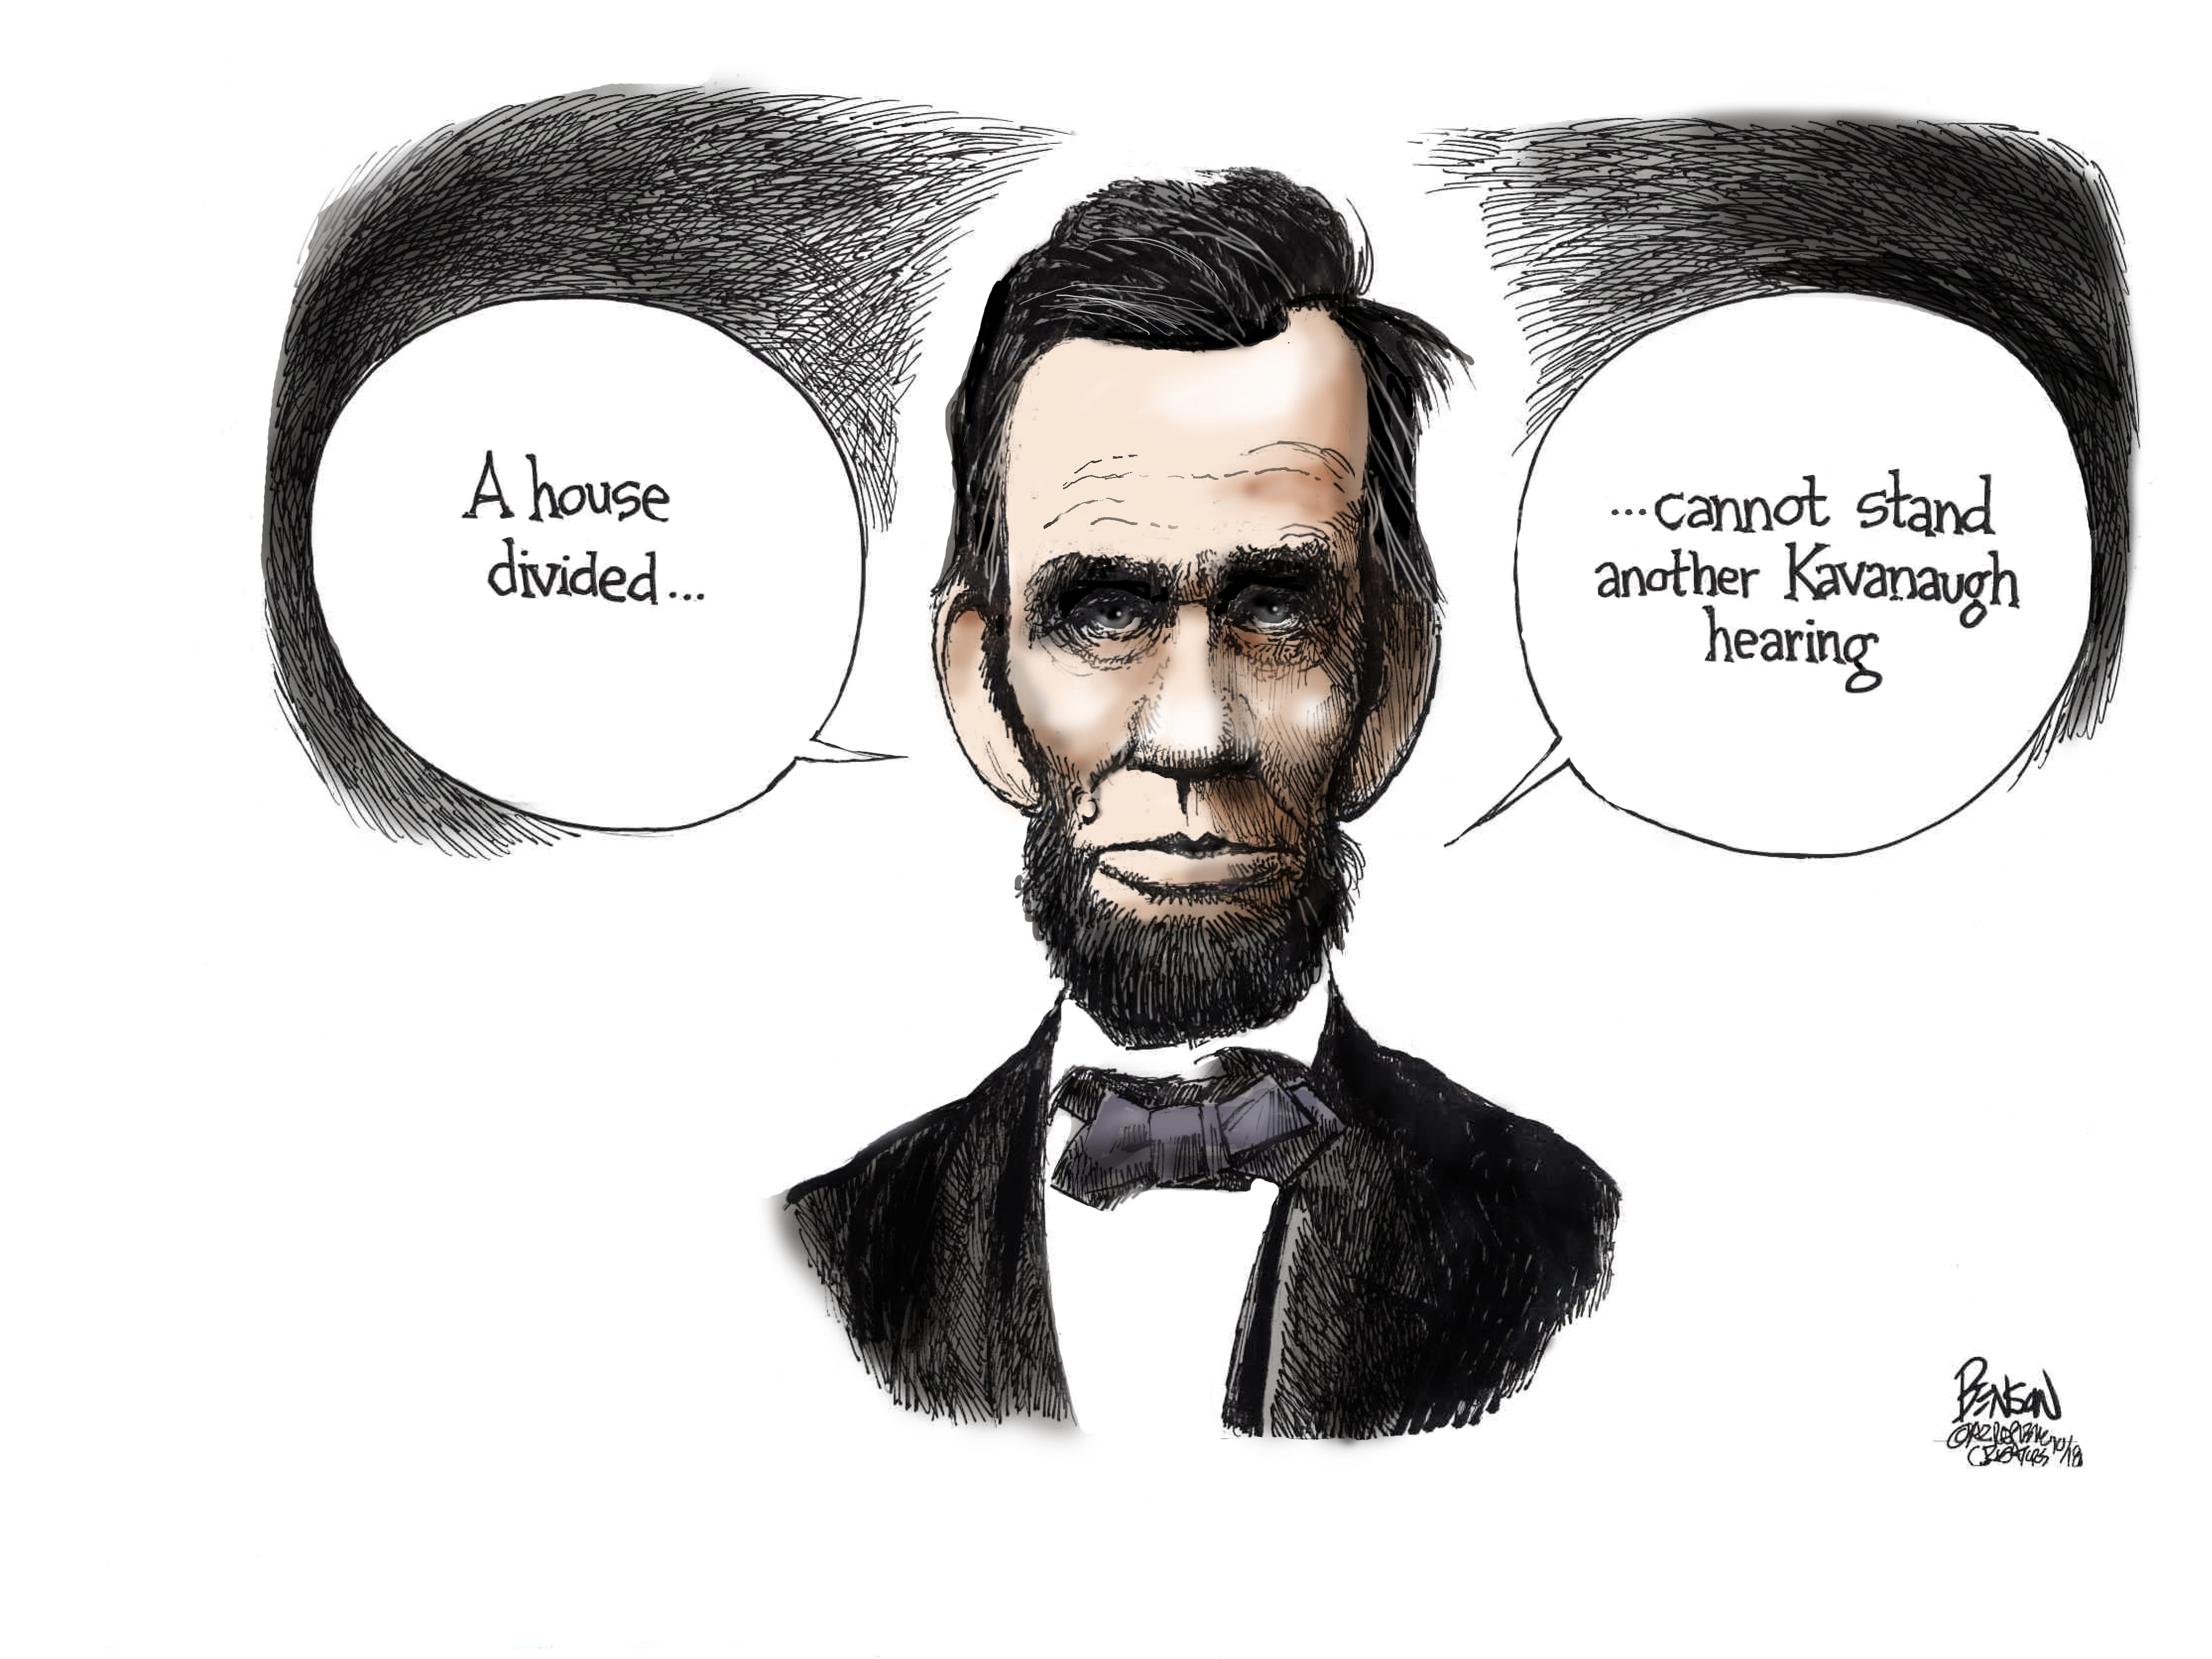 Cartoon for Oct. 5, 2018.